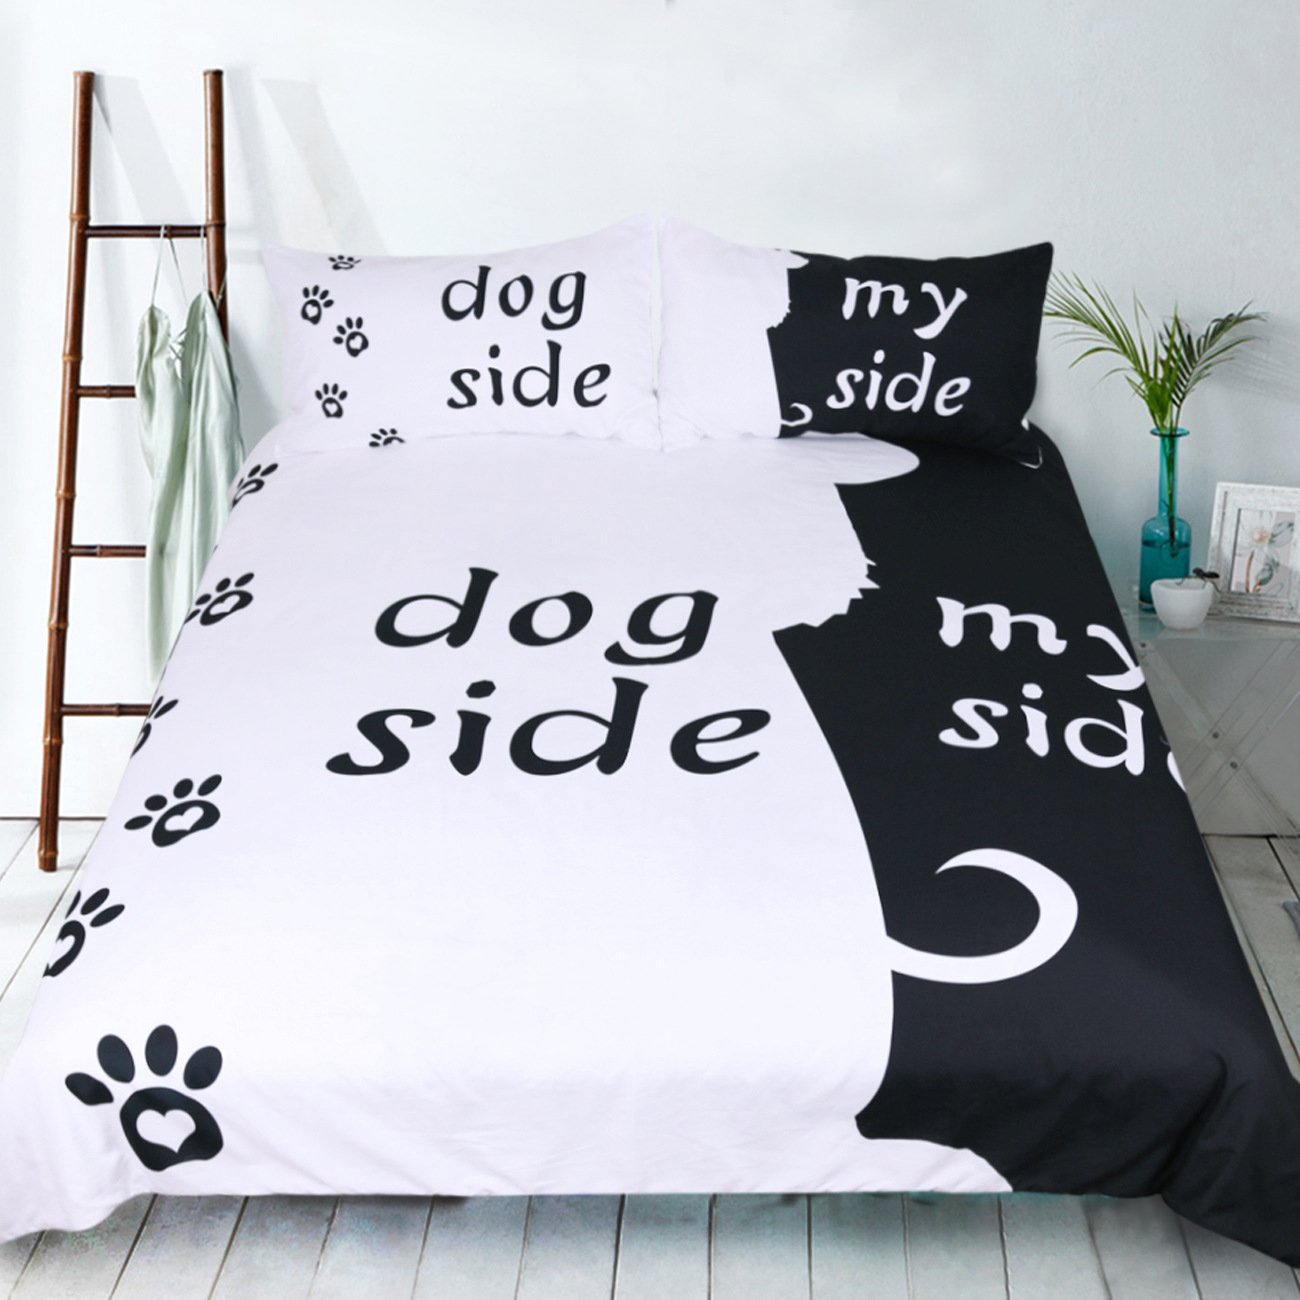 SホテルコレクションCat Side / My Side 3dホワイトブラック羽毛布団カバーセット、2ピースキルトカバーset-extremelyソフト耐久性 キング ブラック B0799JBF2F犬 キング